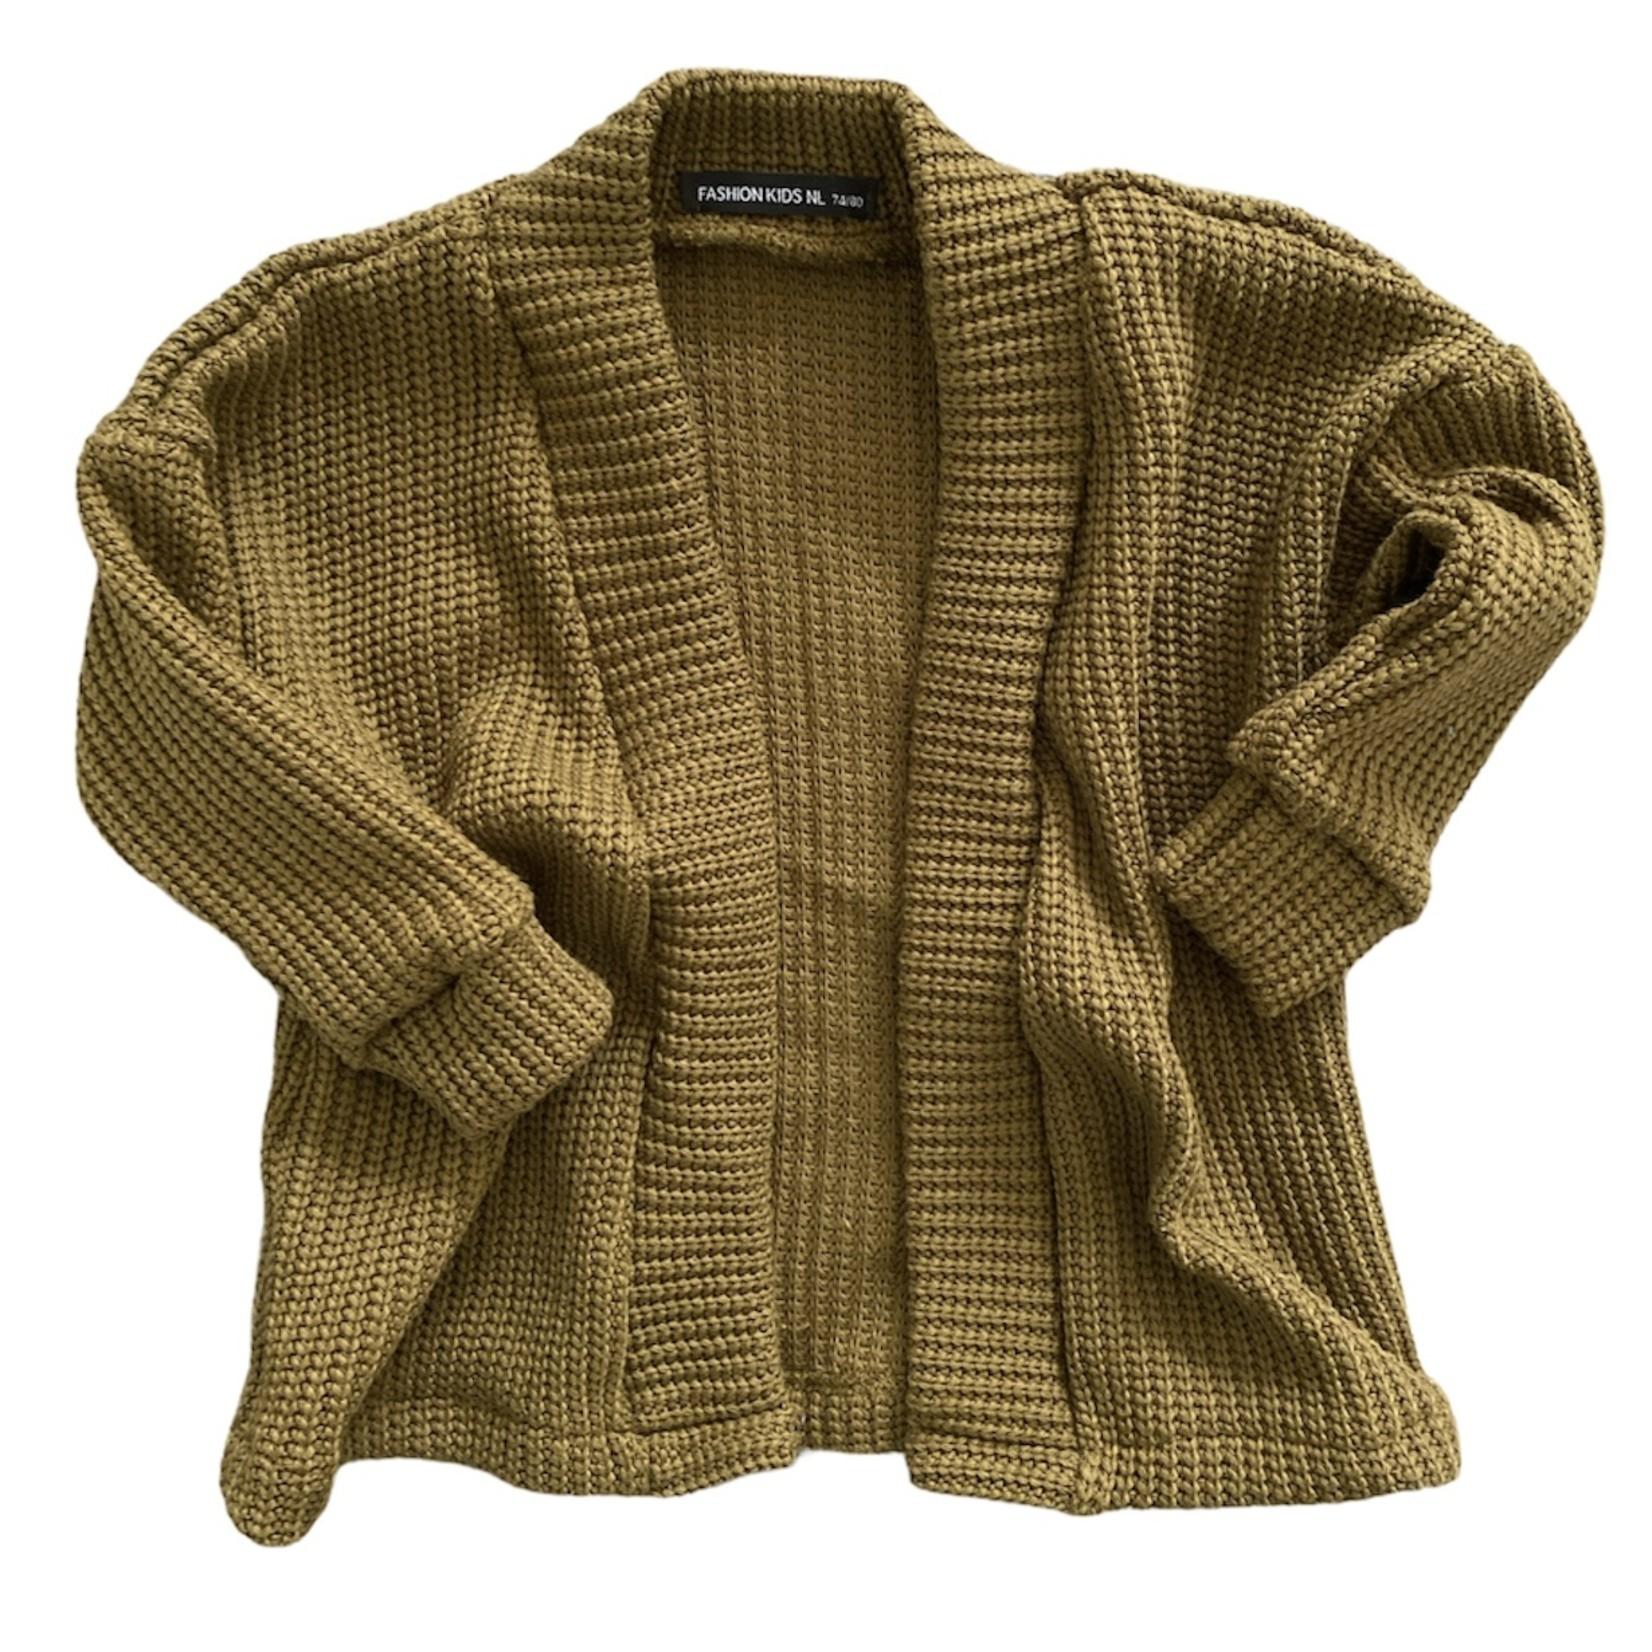 Fashion Kids  Oversized knit vest  olijfgroen  I